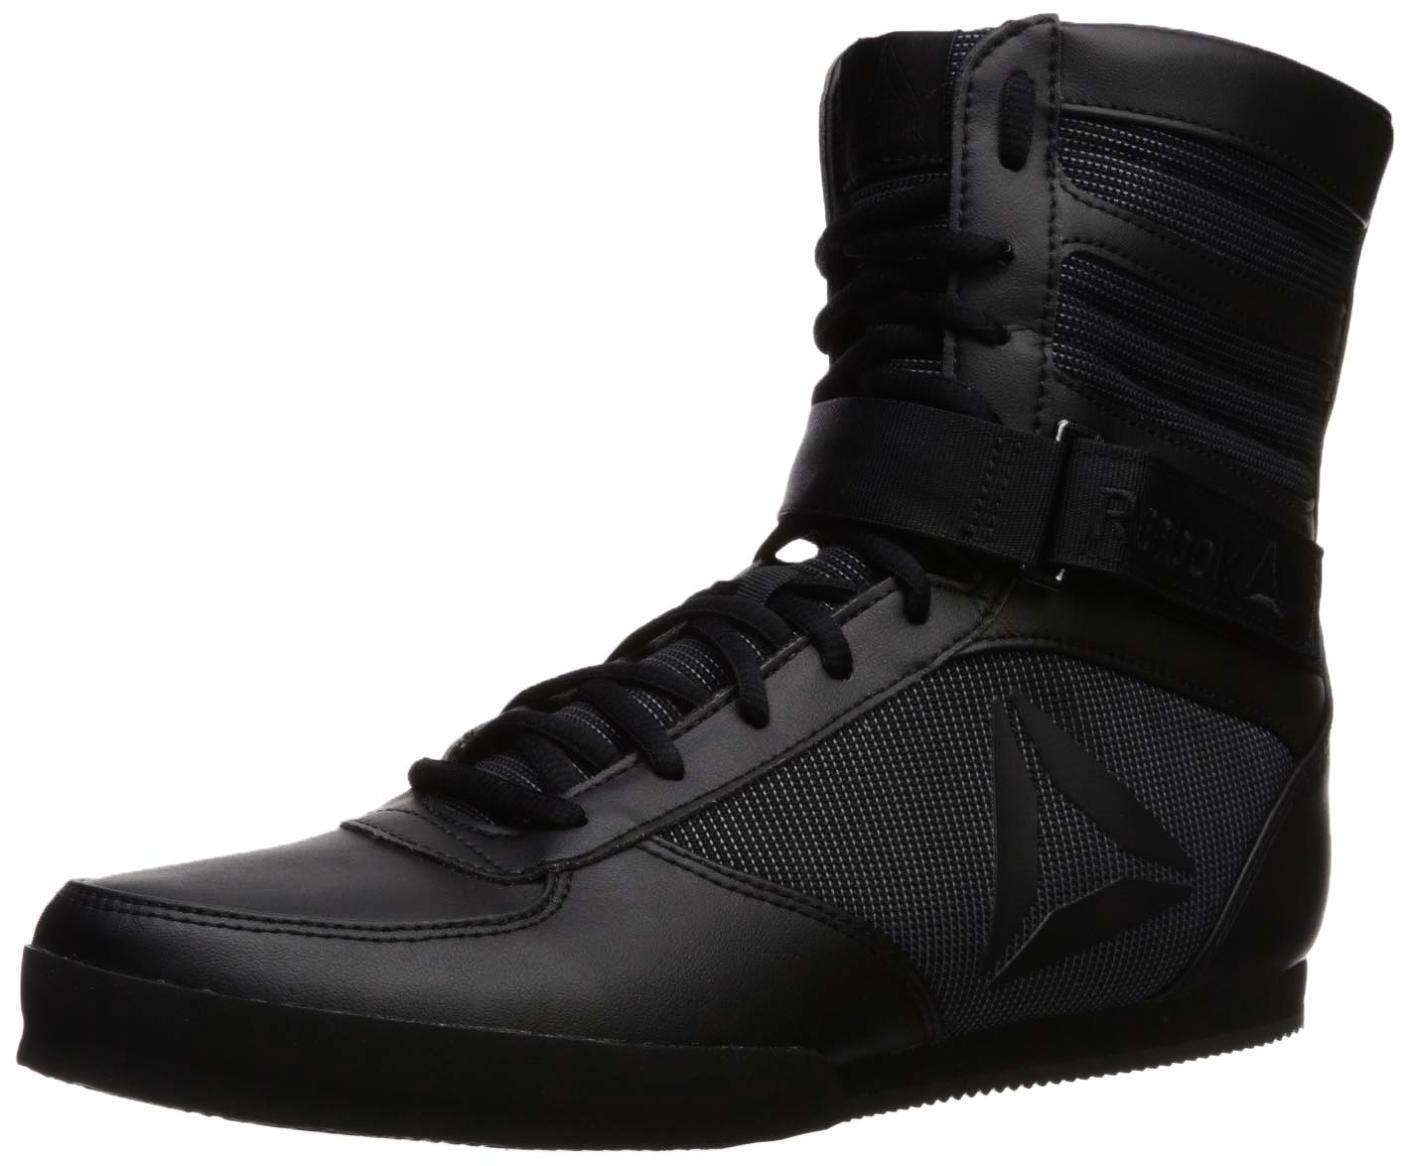 Reebok Men's Boxing Boot- Lx Cross Trainer, - Choose SZ color